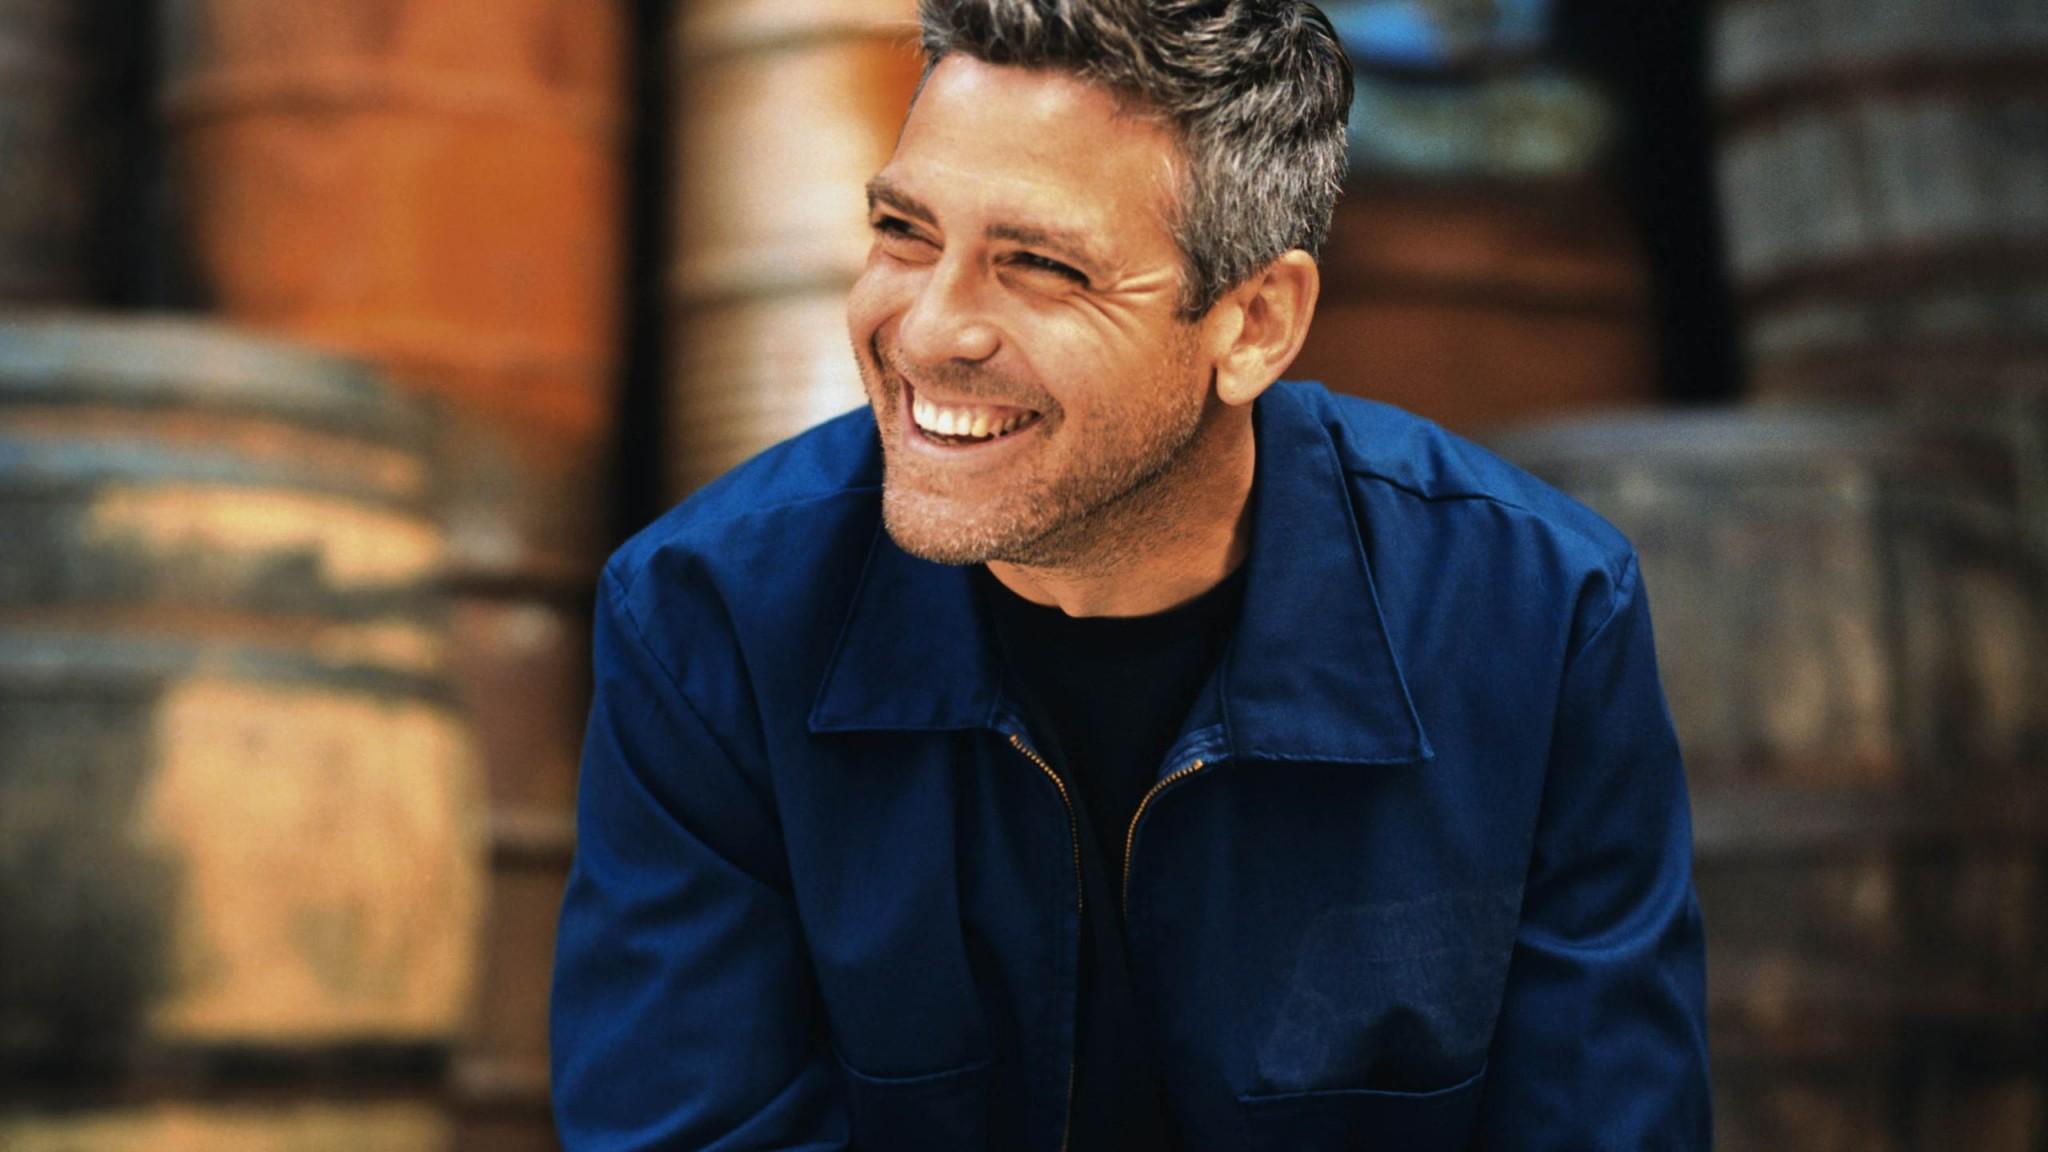 George Clooney Wallpaper 12